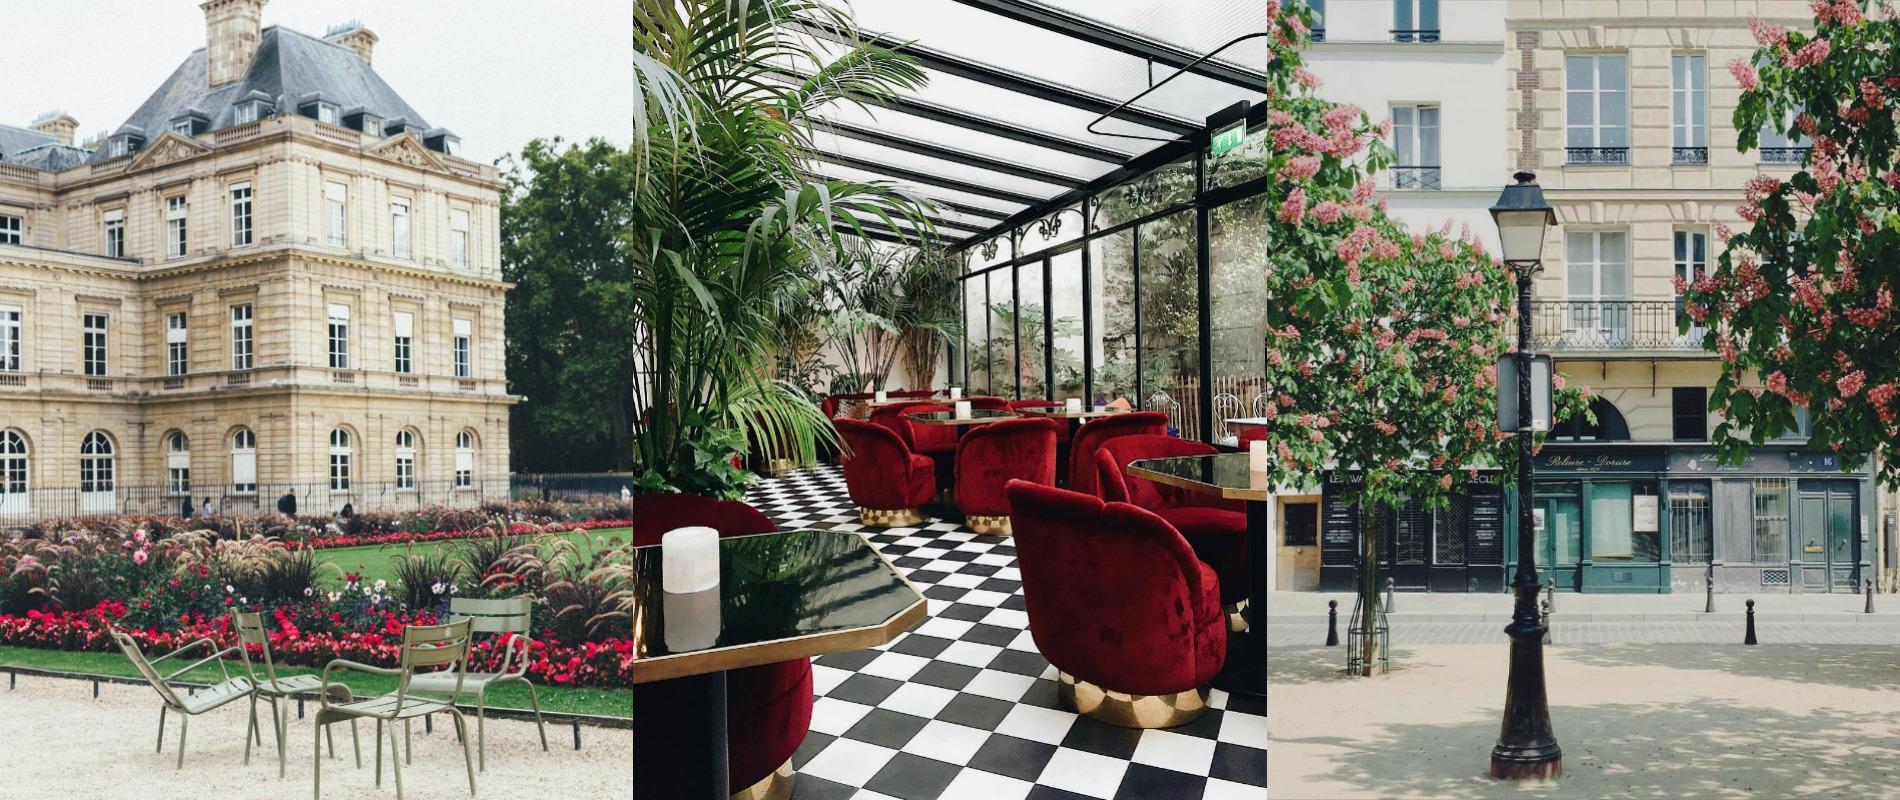 jardins rooftops h tels quinze lieux o faire sa demande. Black Bedroom Furniture Sets. Home Design Ideas